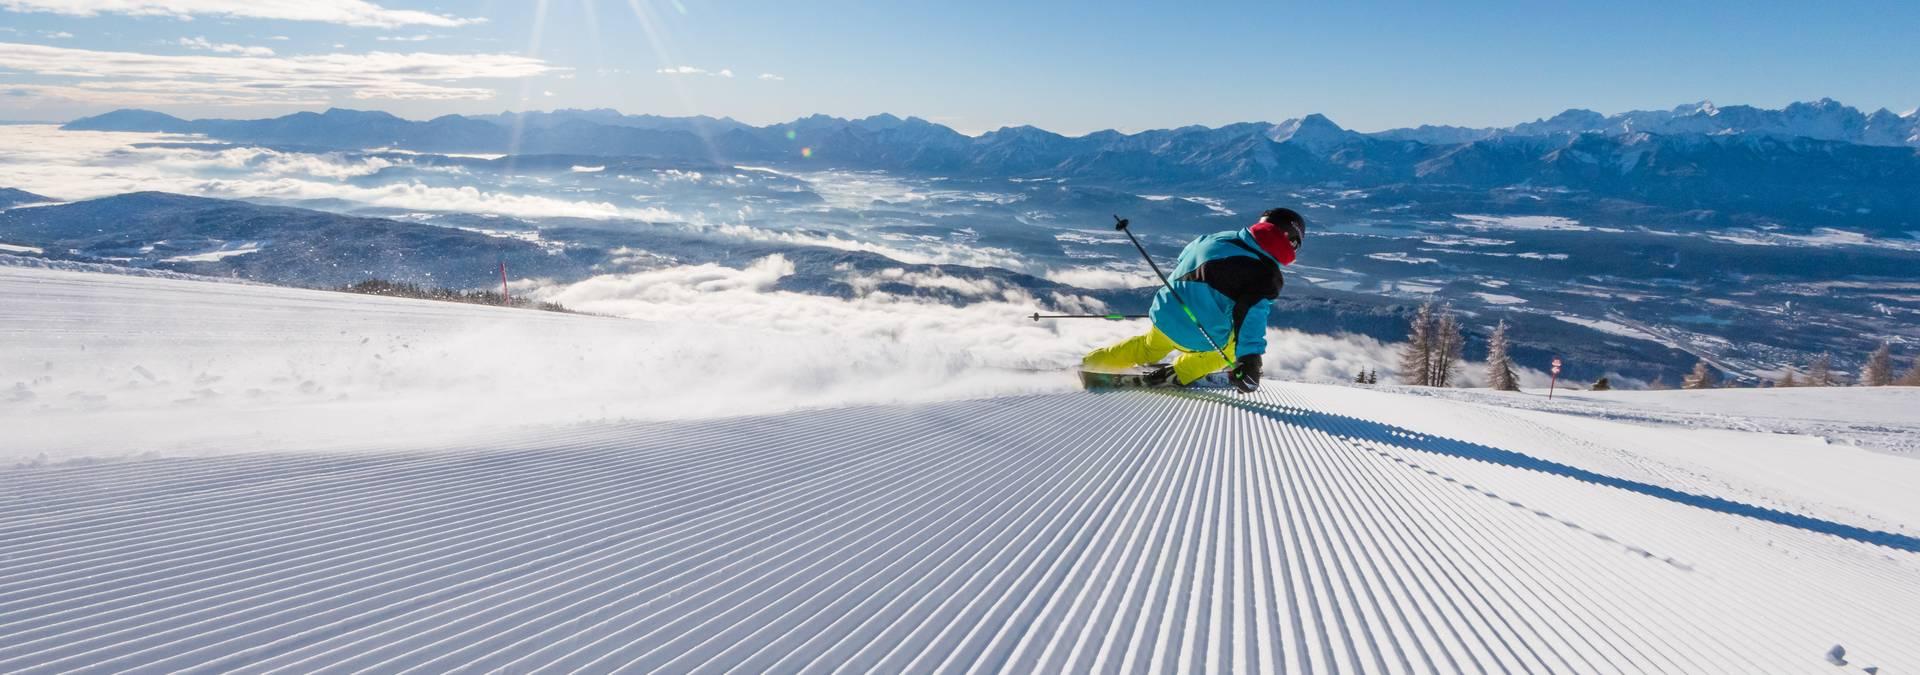 Skifahren Gerlitzen MichaelStabentheiner2